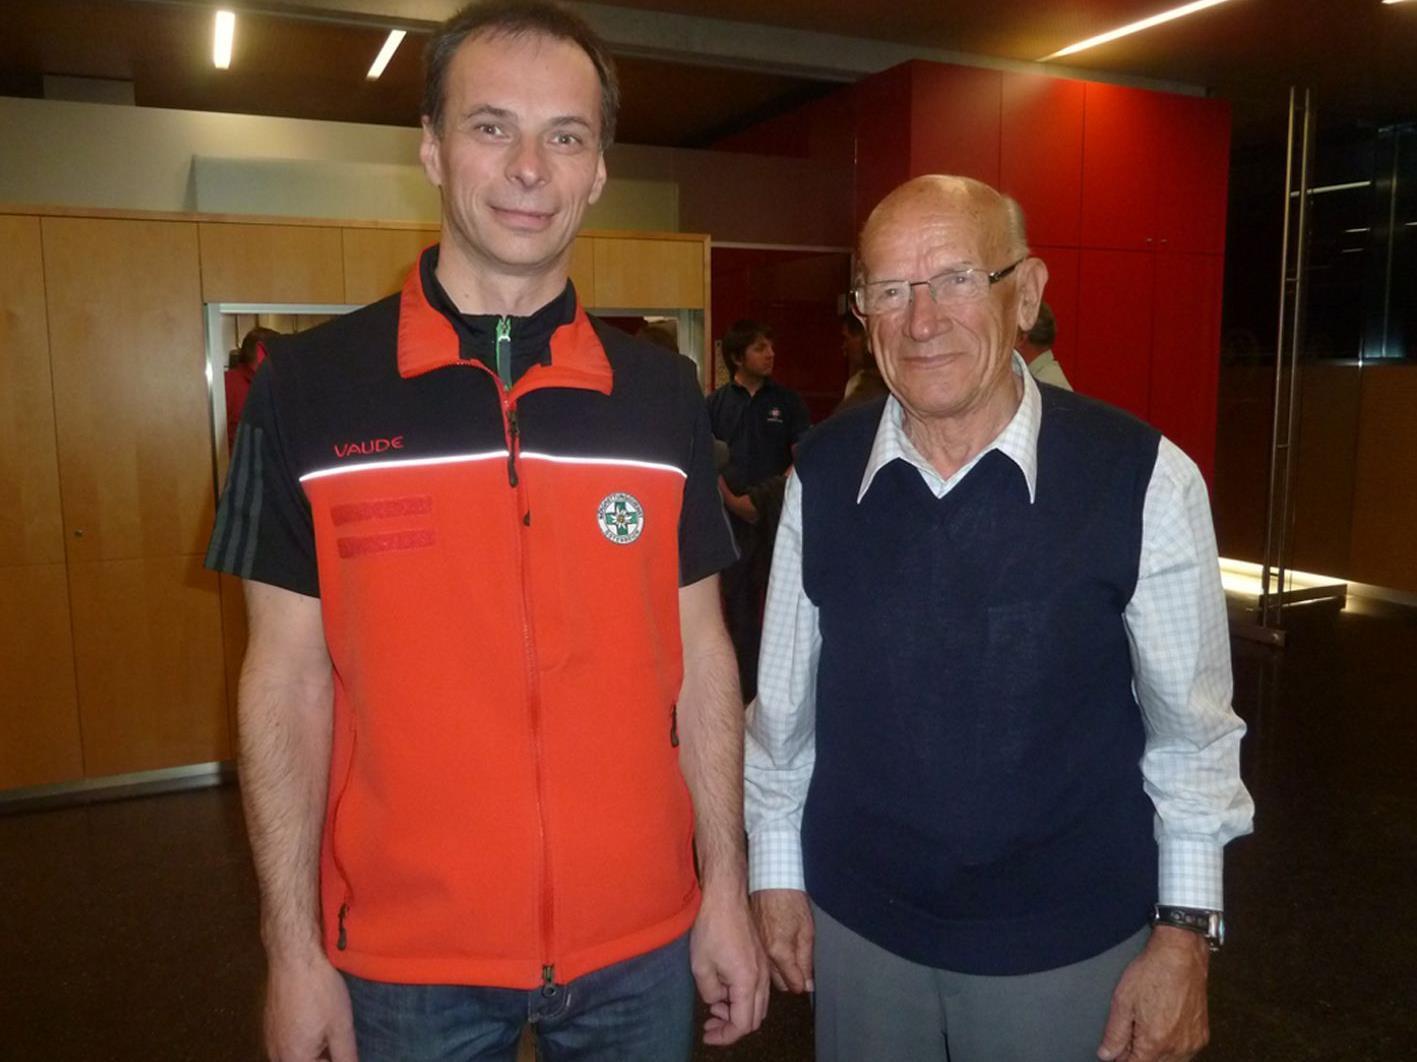 Bergrettungs-Obmann Herbert Linder mit Gründungsmitglied Heini Lohs.